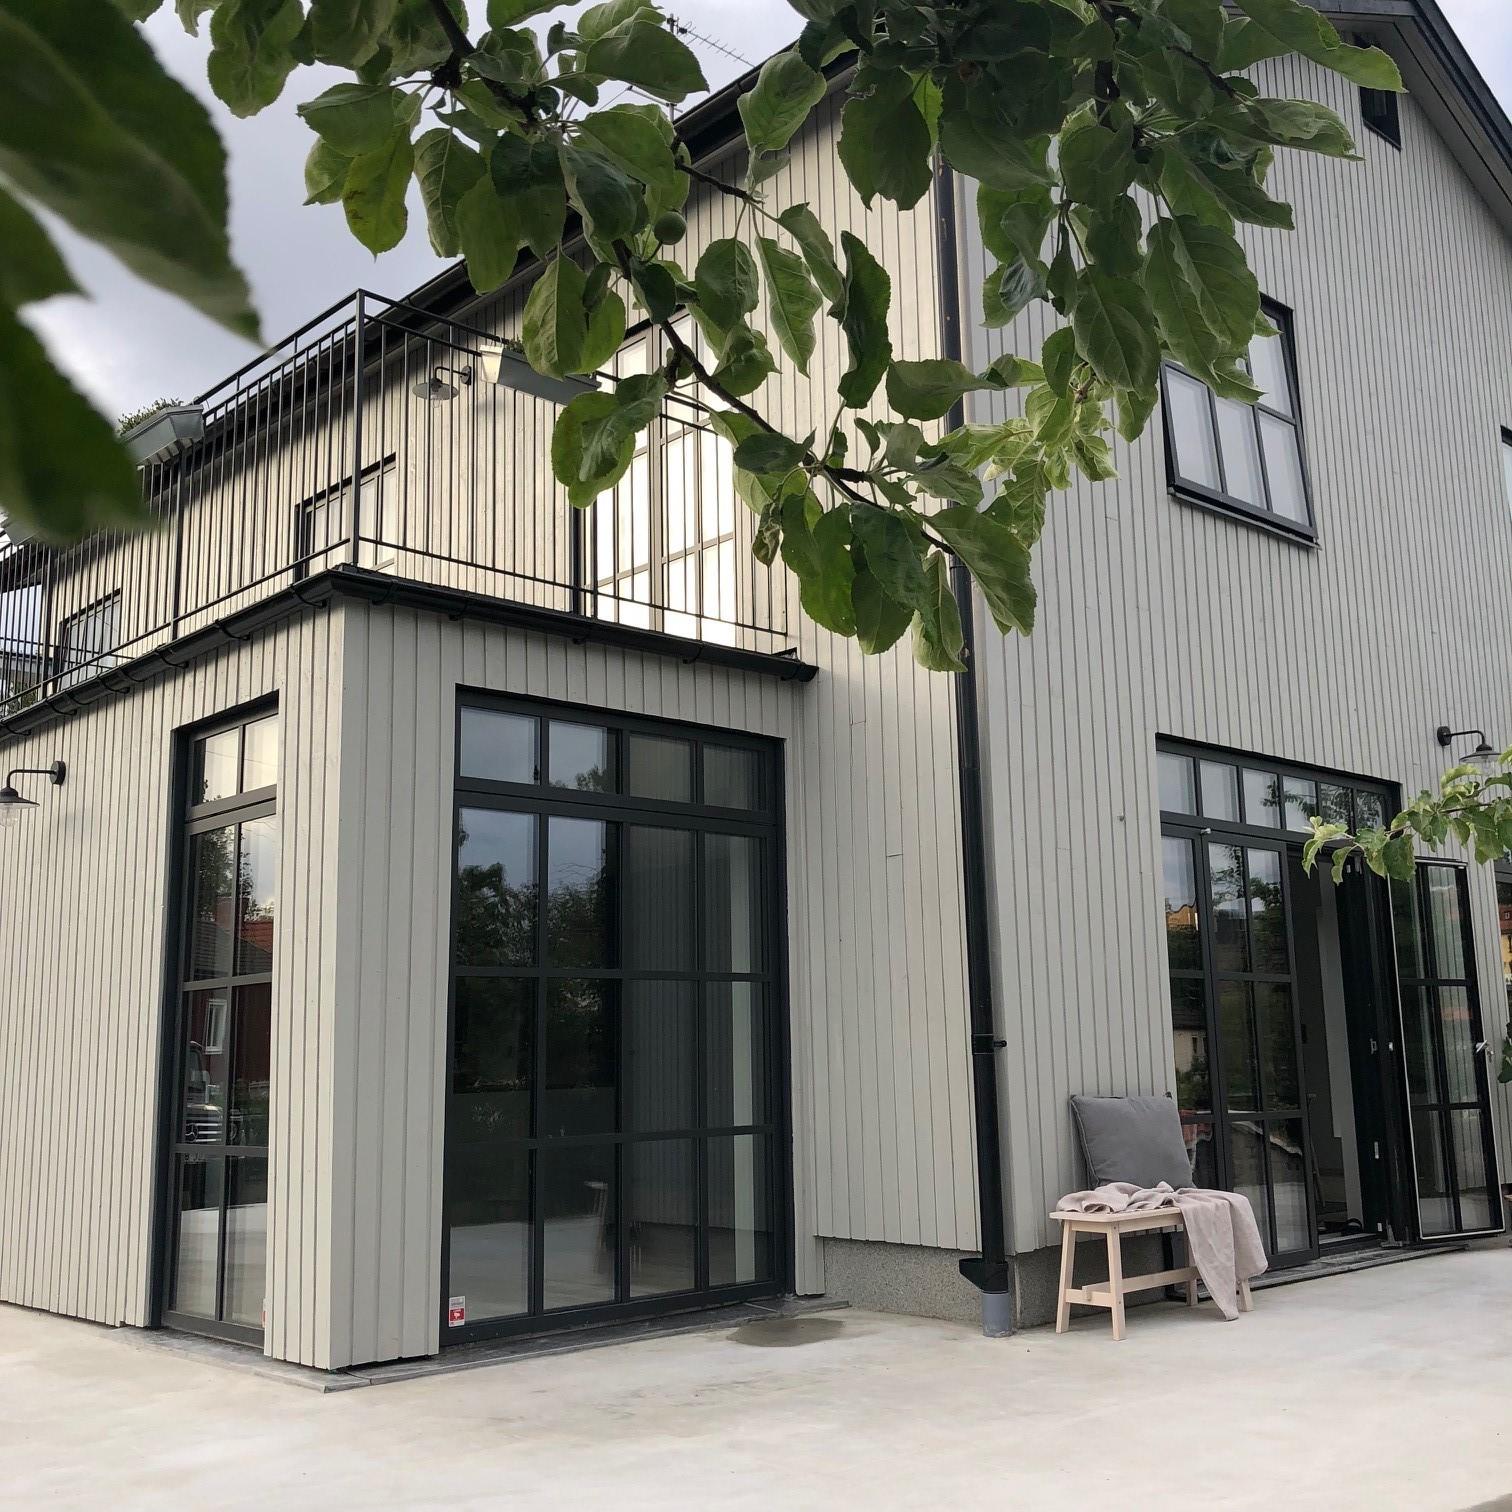 Klesdesignerens varmgrå villa